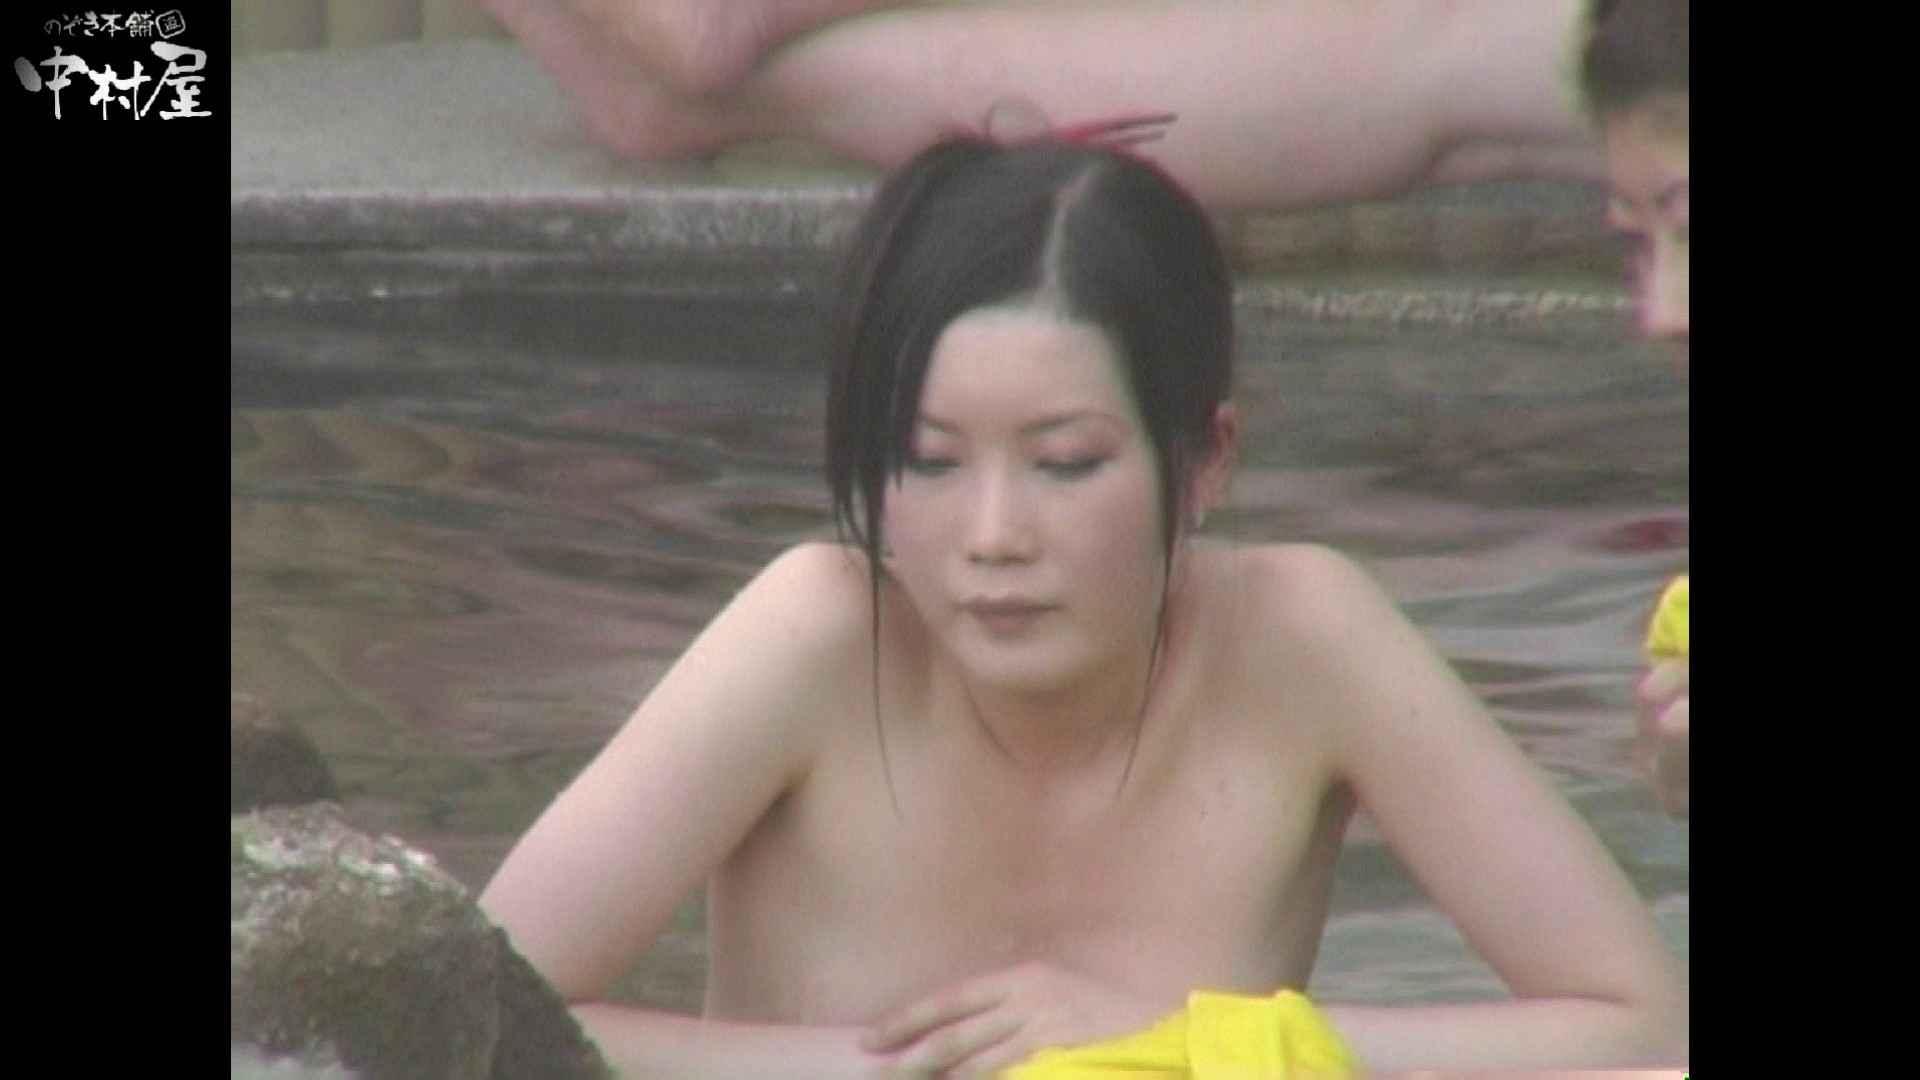 Aquaな露天風呂Vol.940 OLセックス  98画像 60